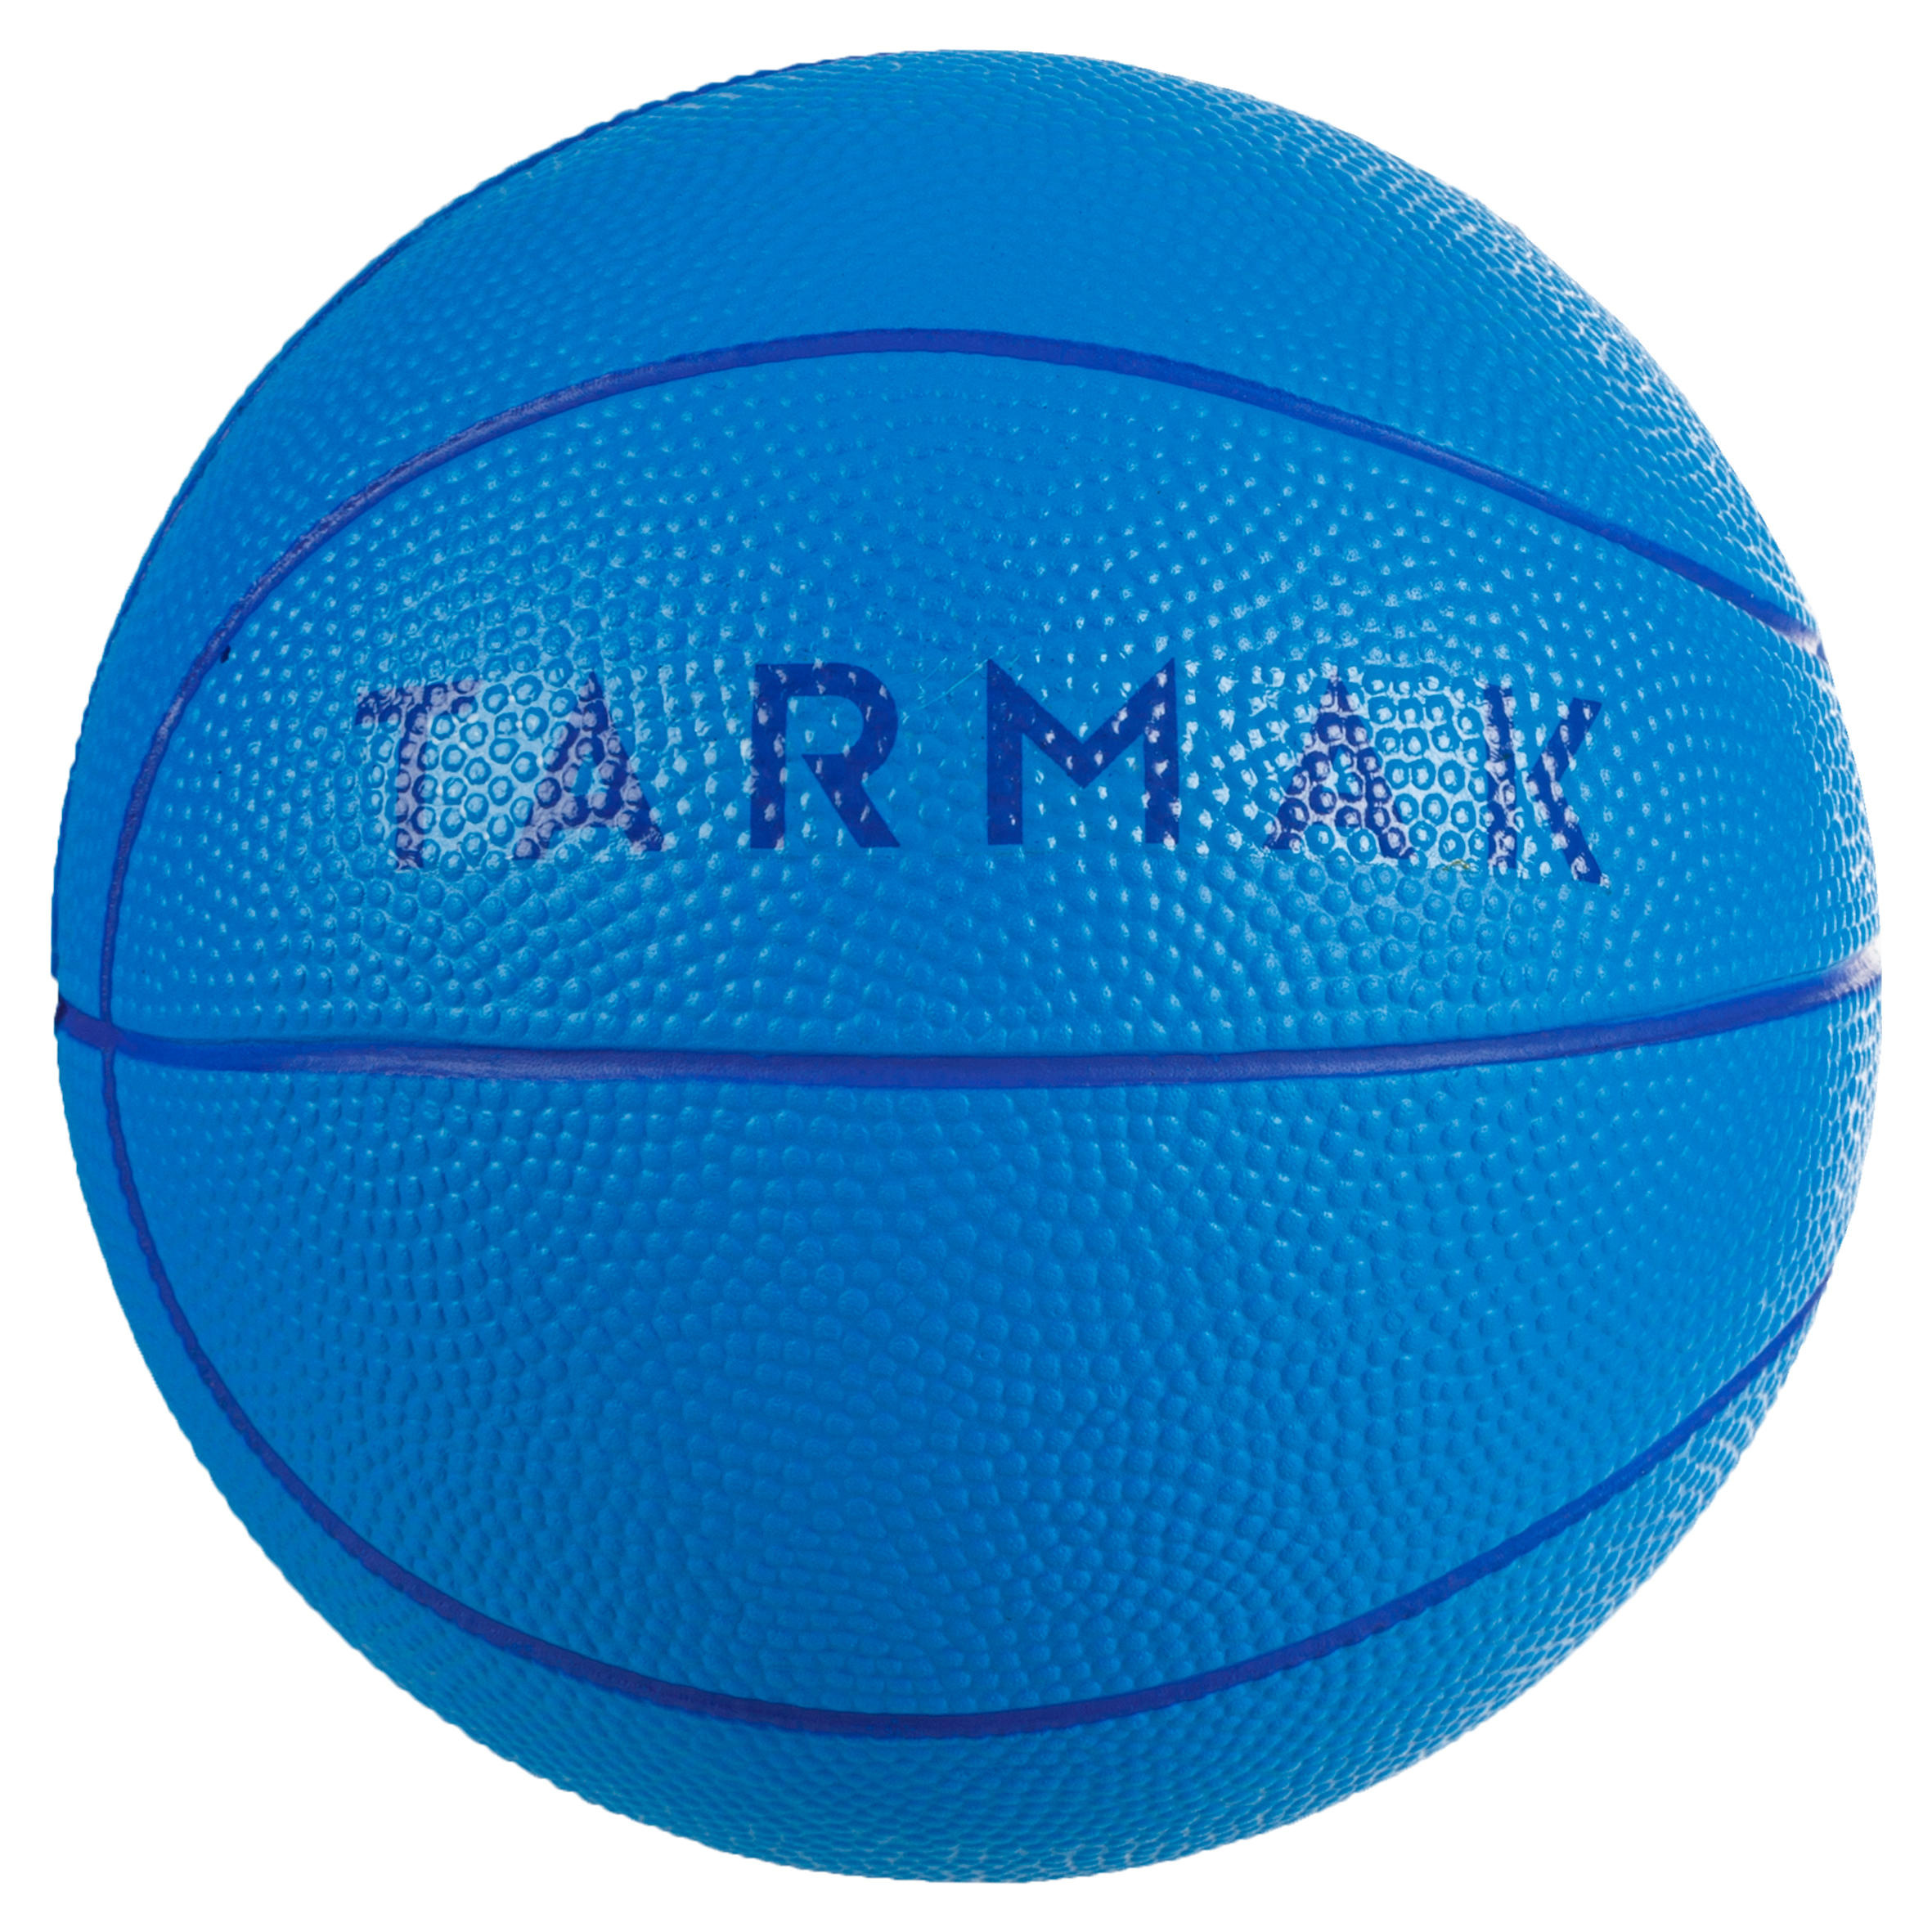 K100 Azul. Minibalón de básquetbol de espuma júnior, talla 1. Hasta 4 años.